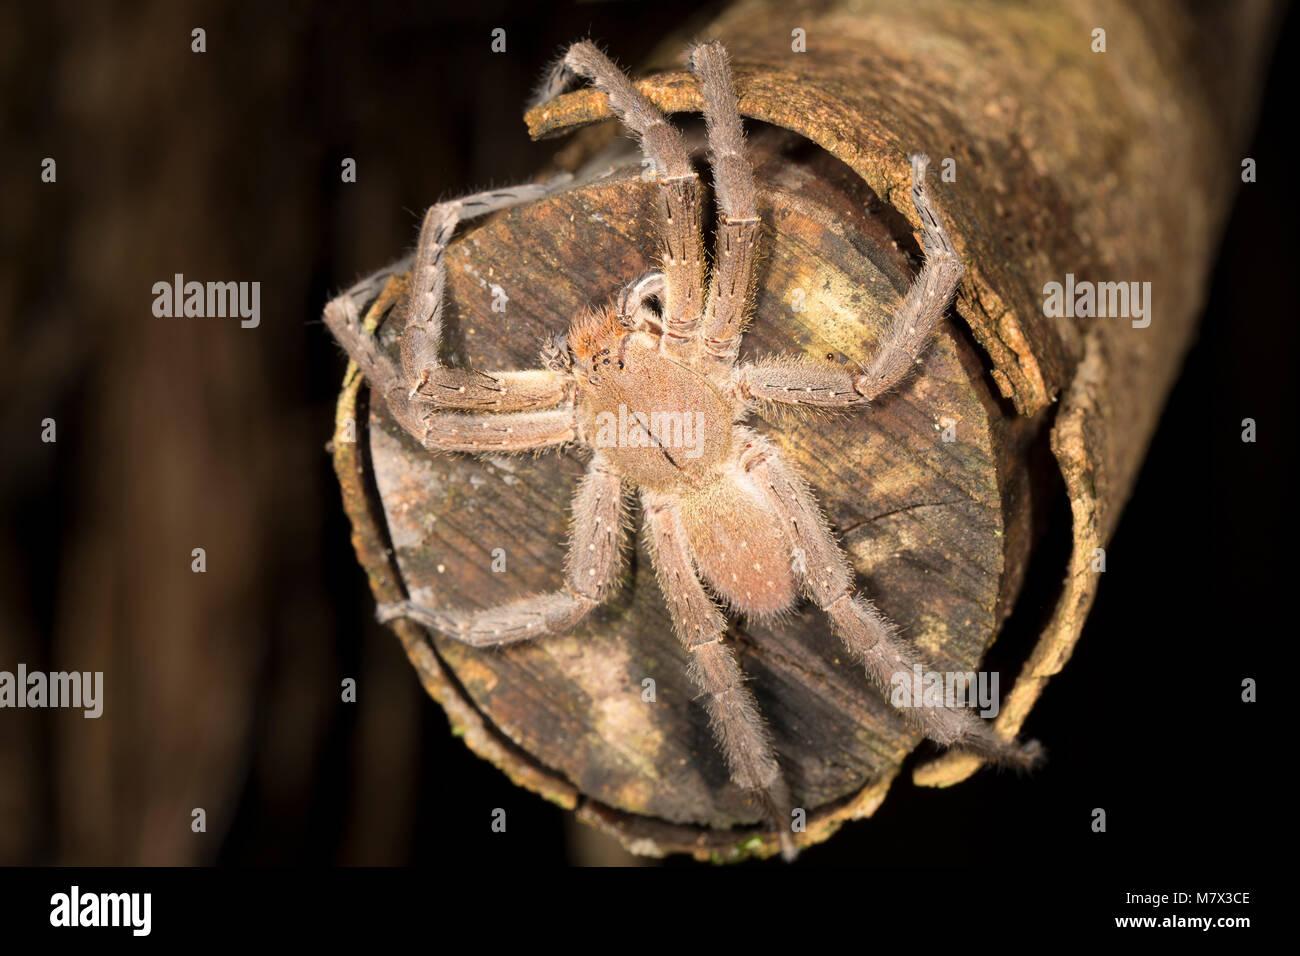 A Brazilian Wandering Spider Phoneutria Fera In Jungle Camp By The Coppename River Suriname